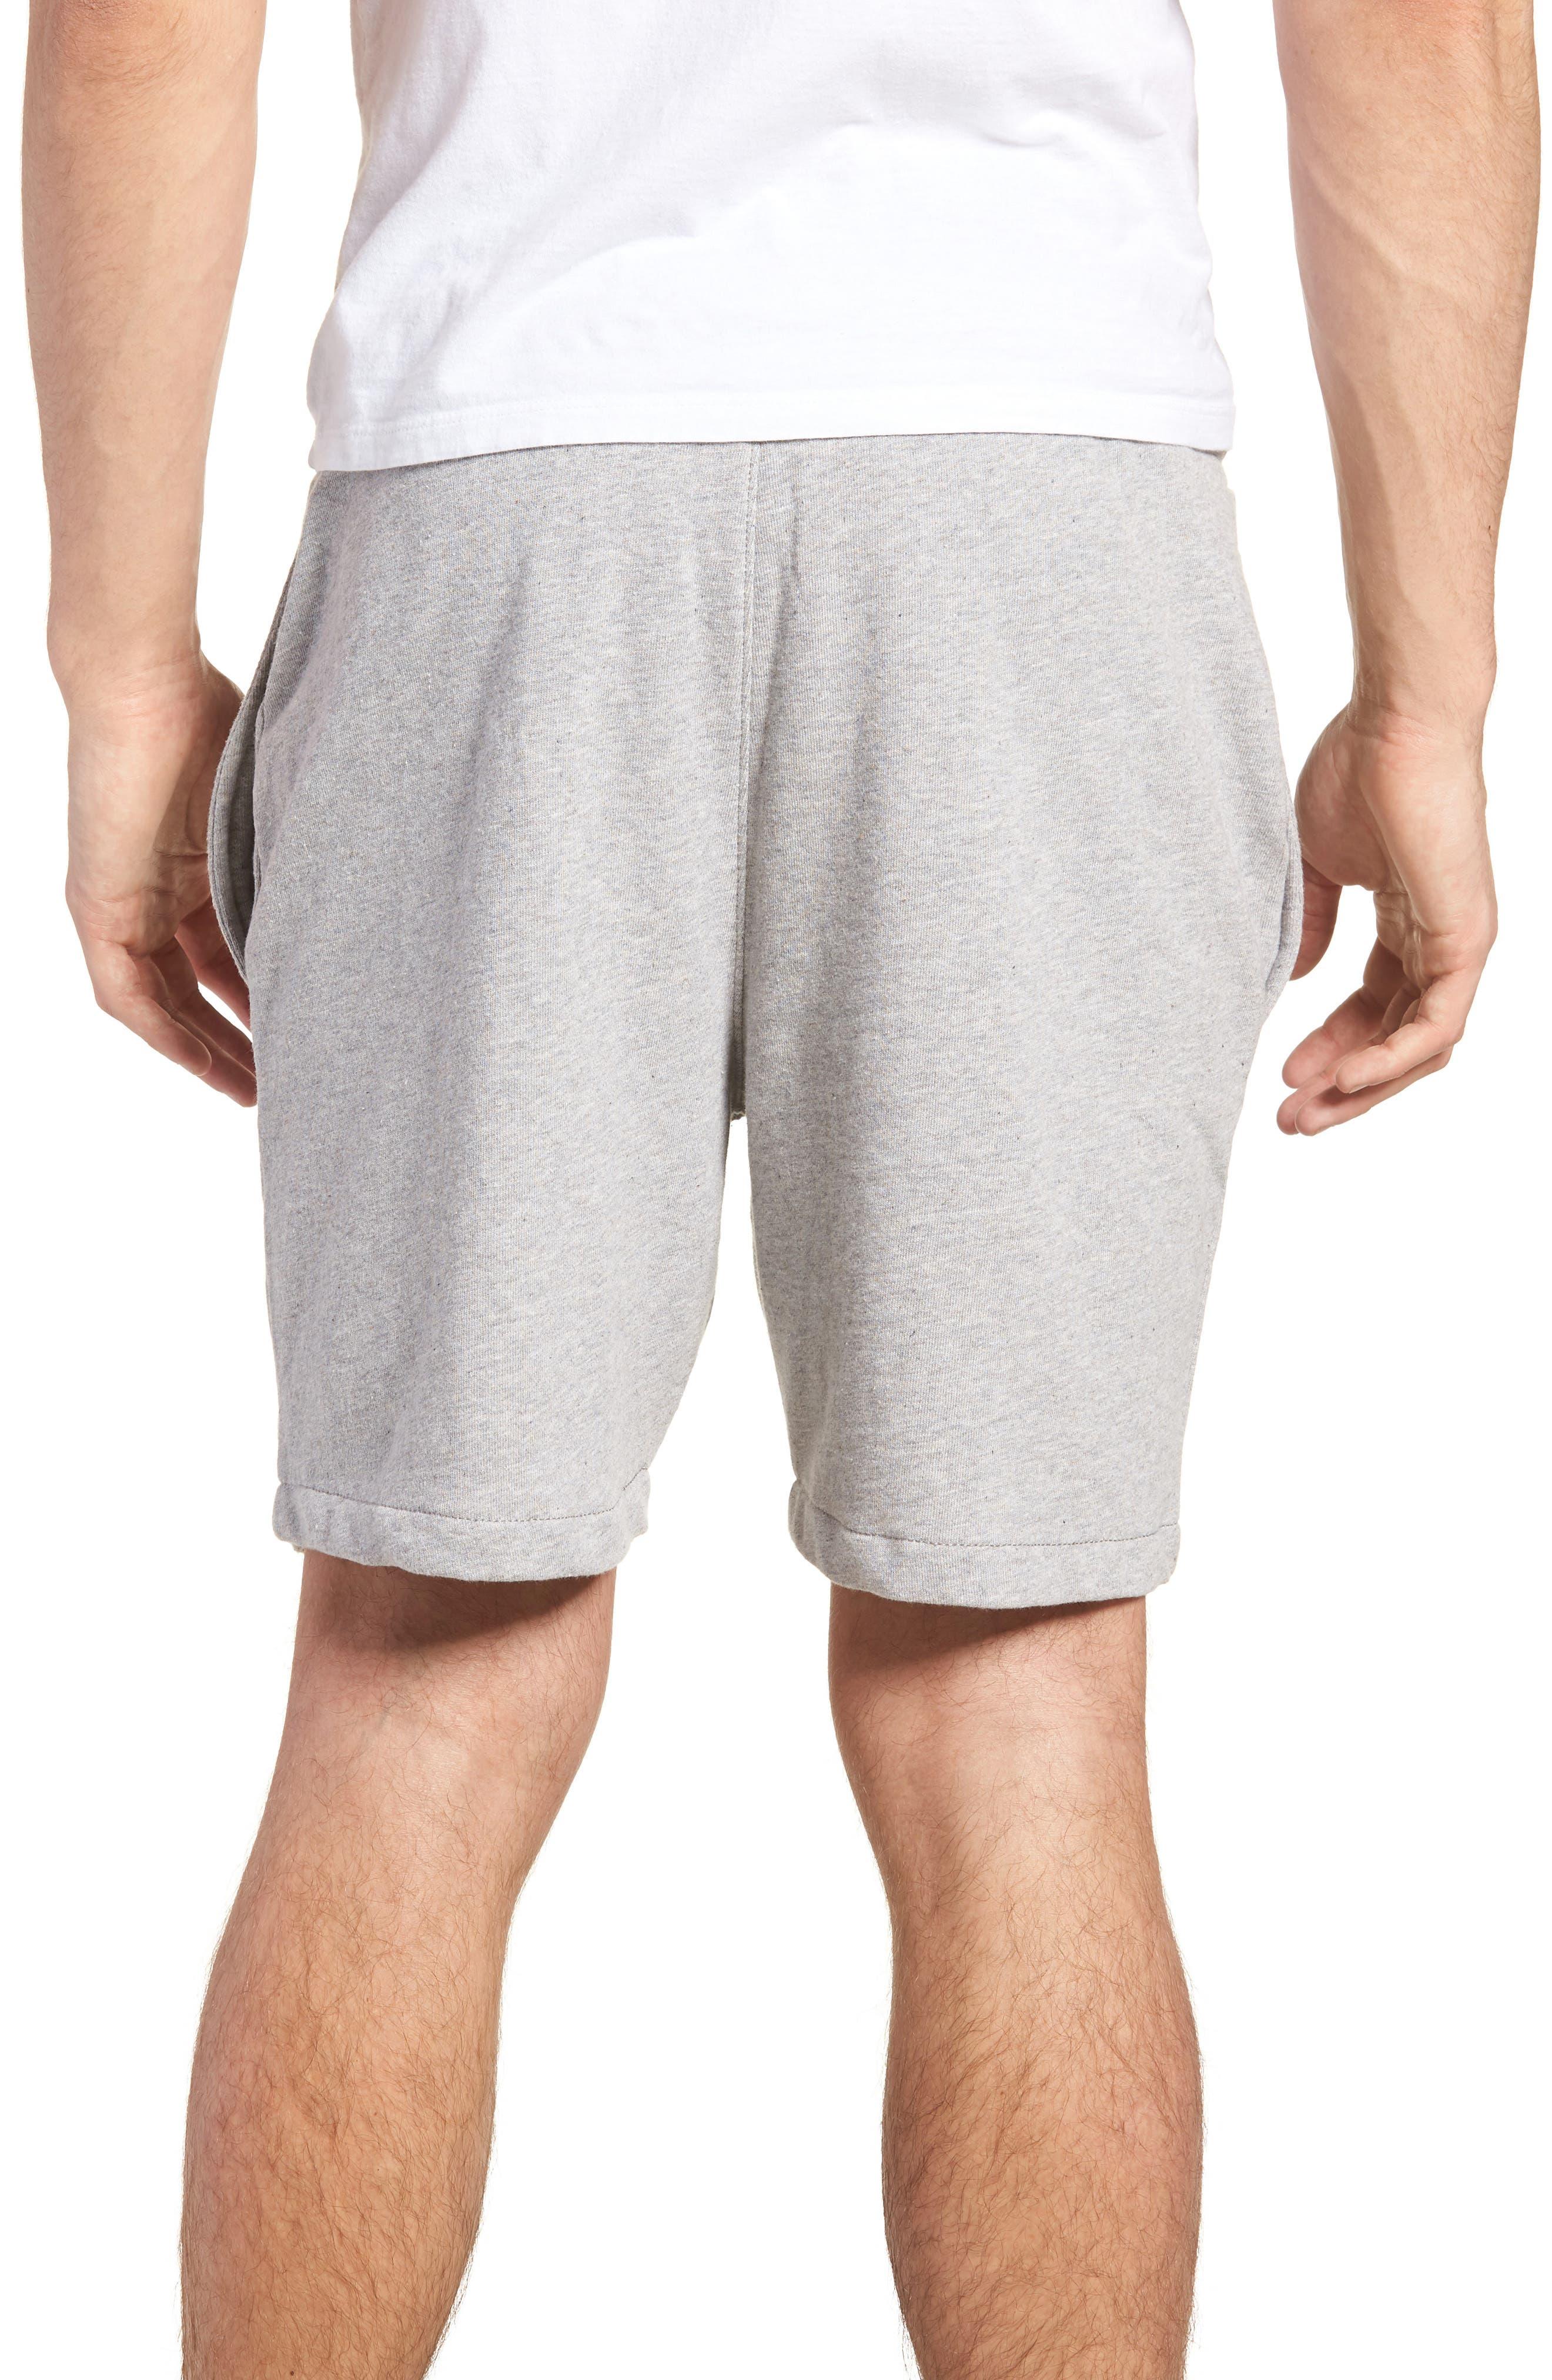 Sweat Shorts,                             Alternate thumbnail 2, color,                             038